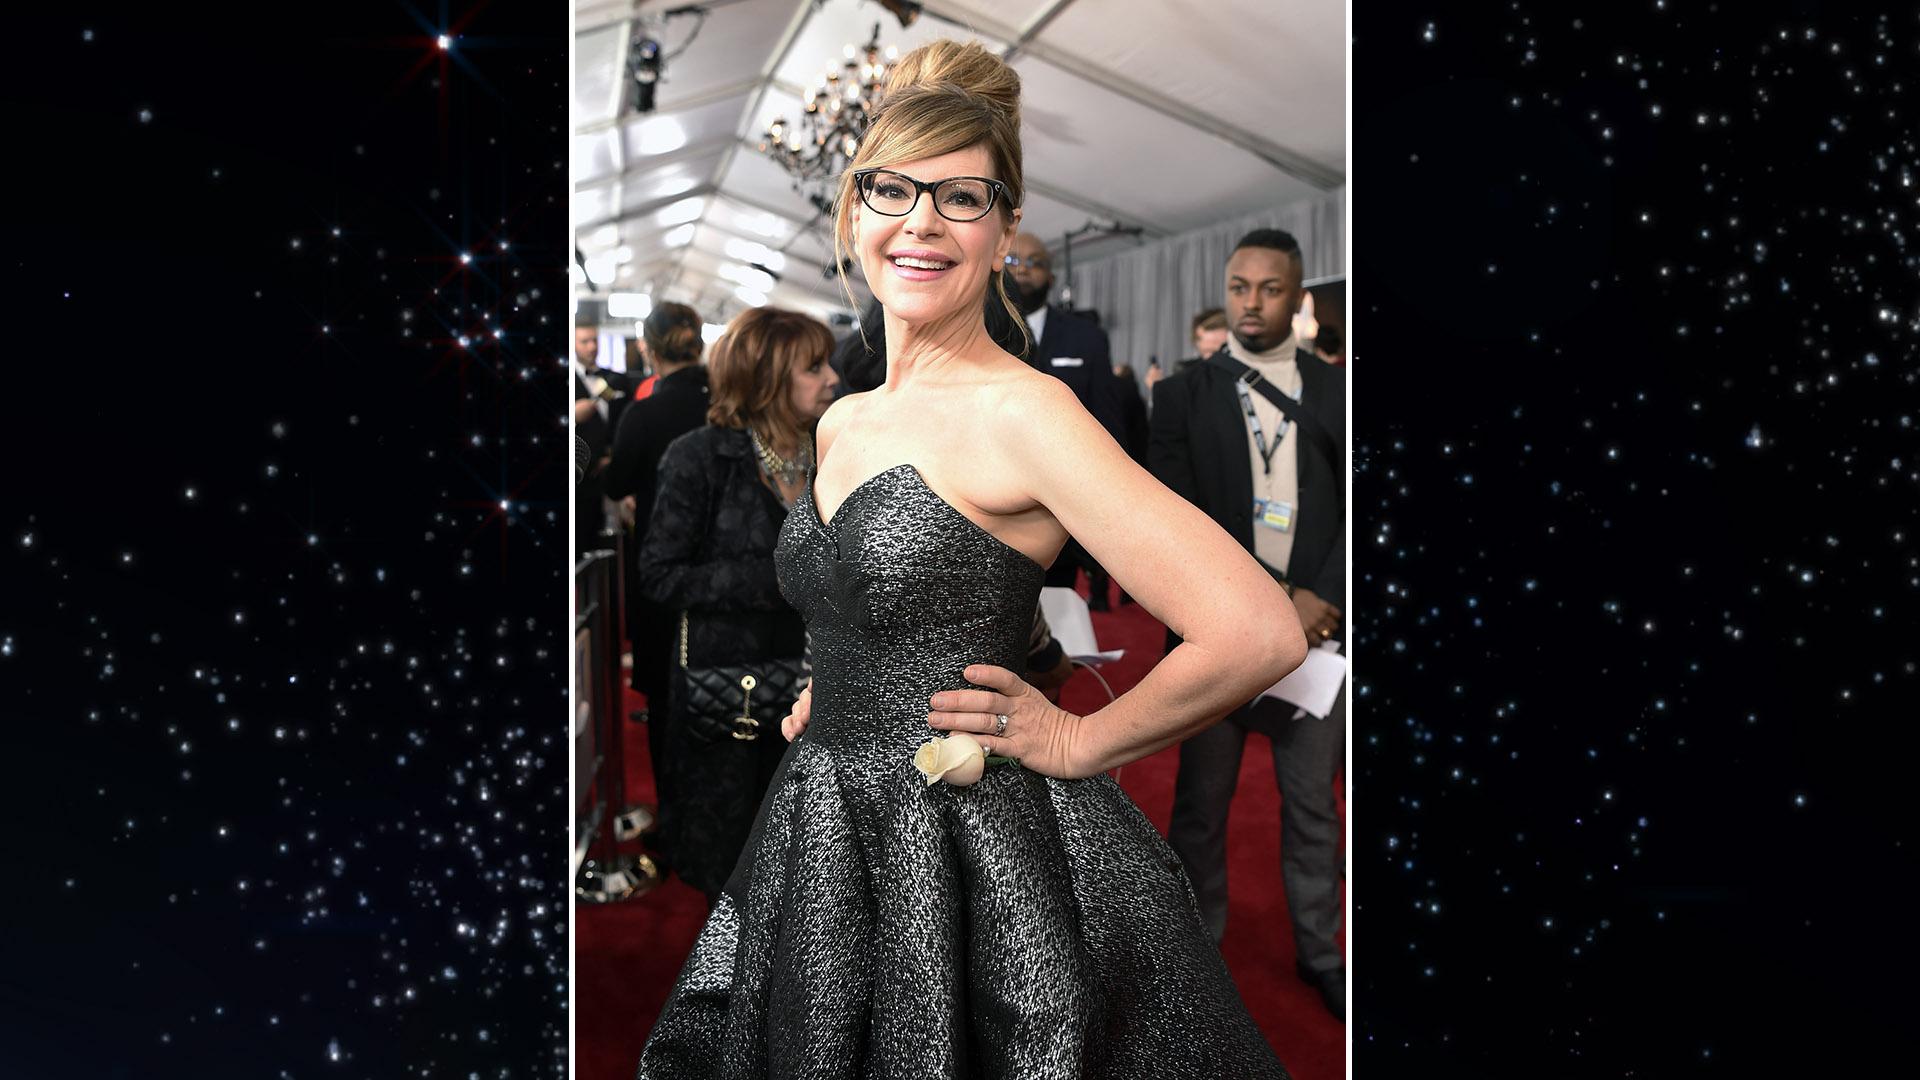 Singer Lisa Loeb celebrates her Best Children's Album win in a shimmery gray ball gown.